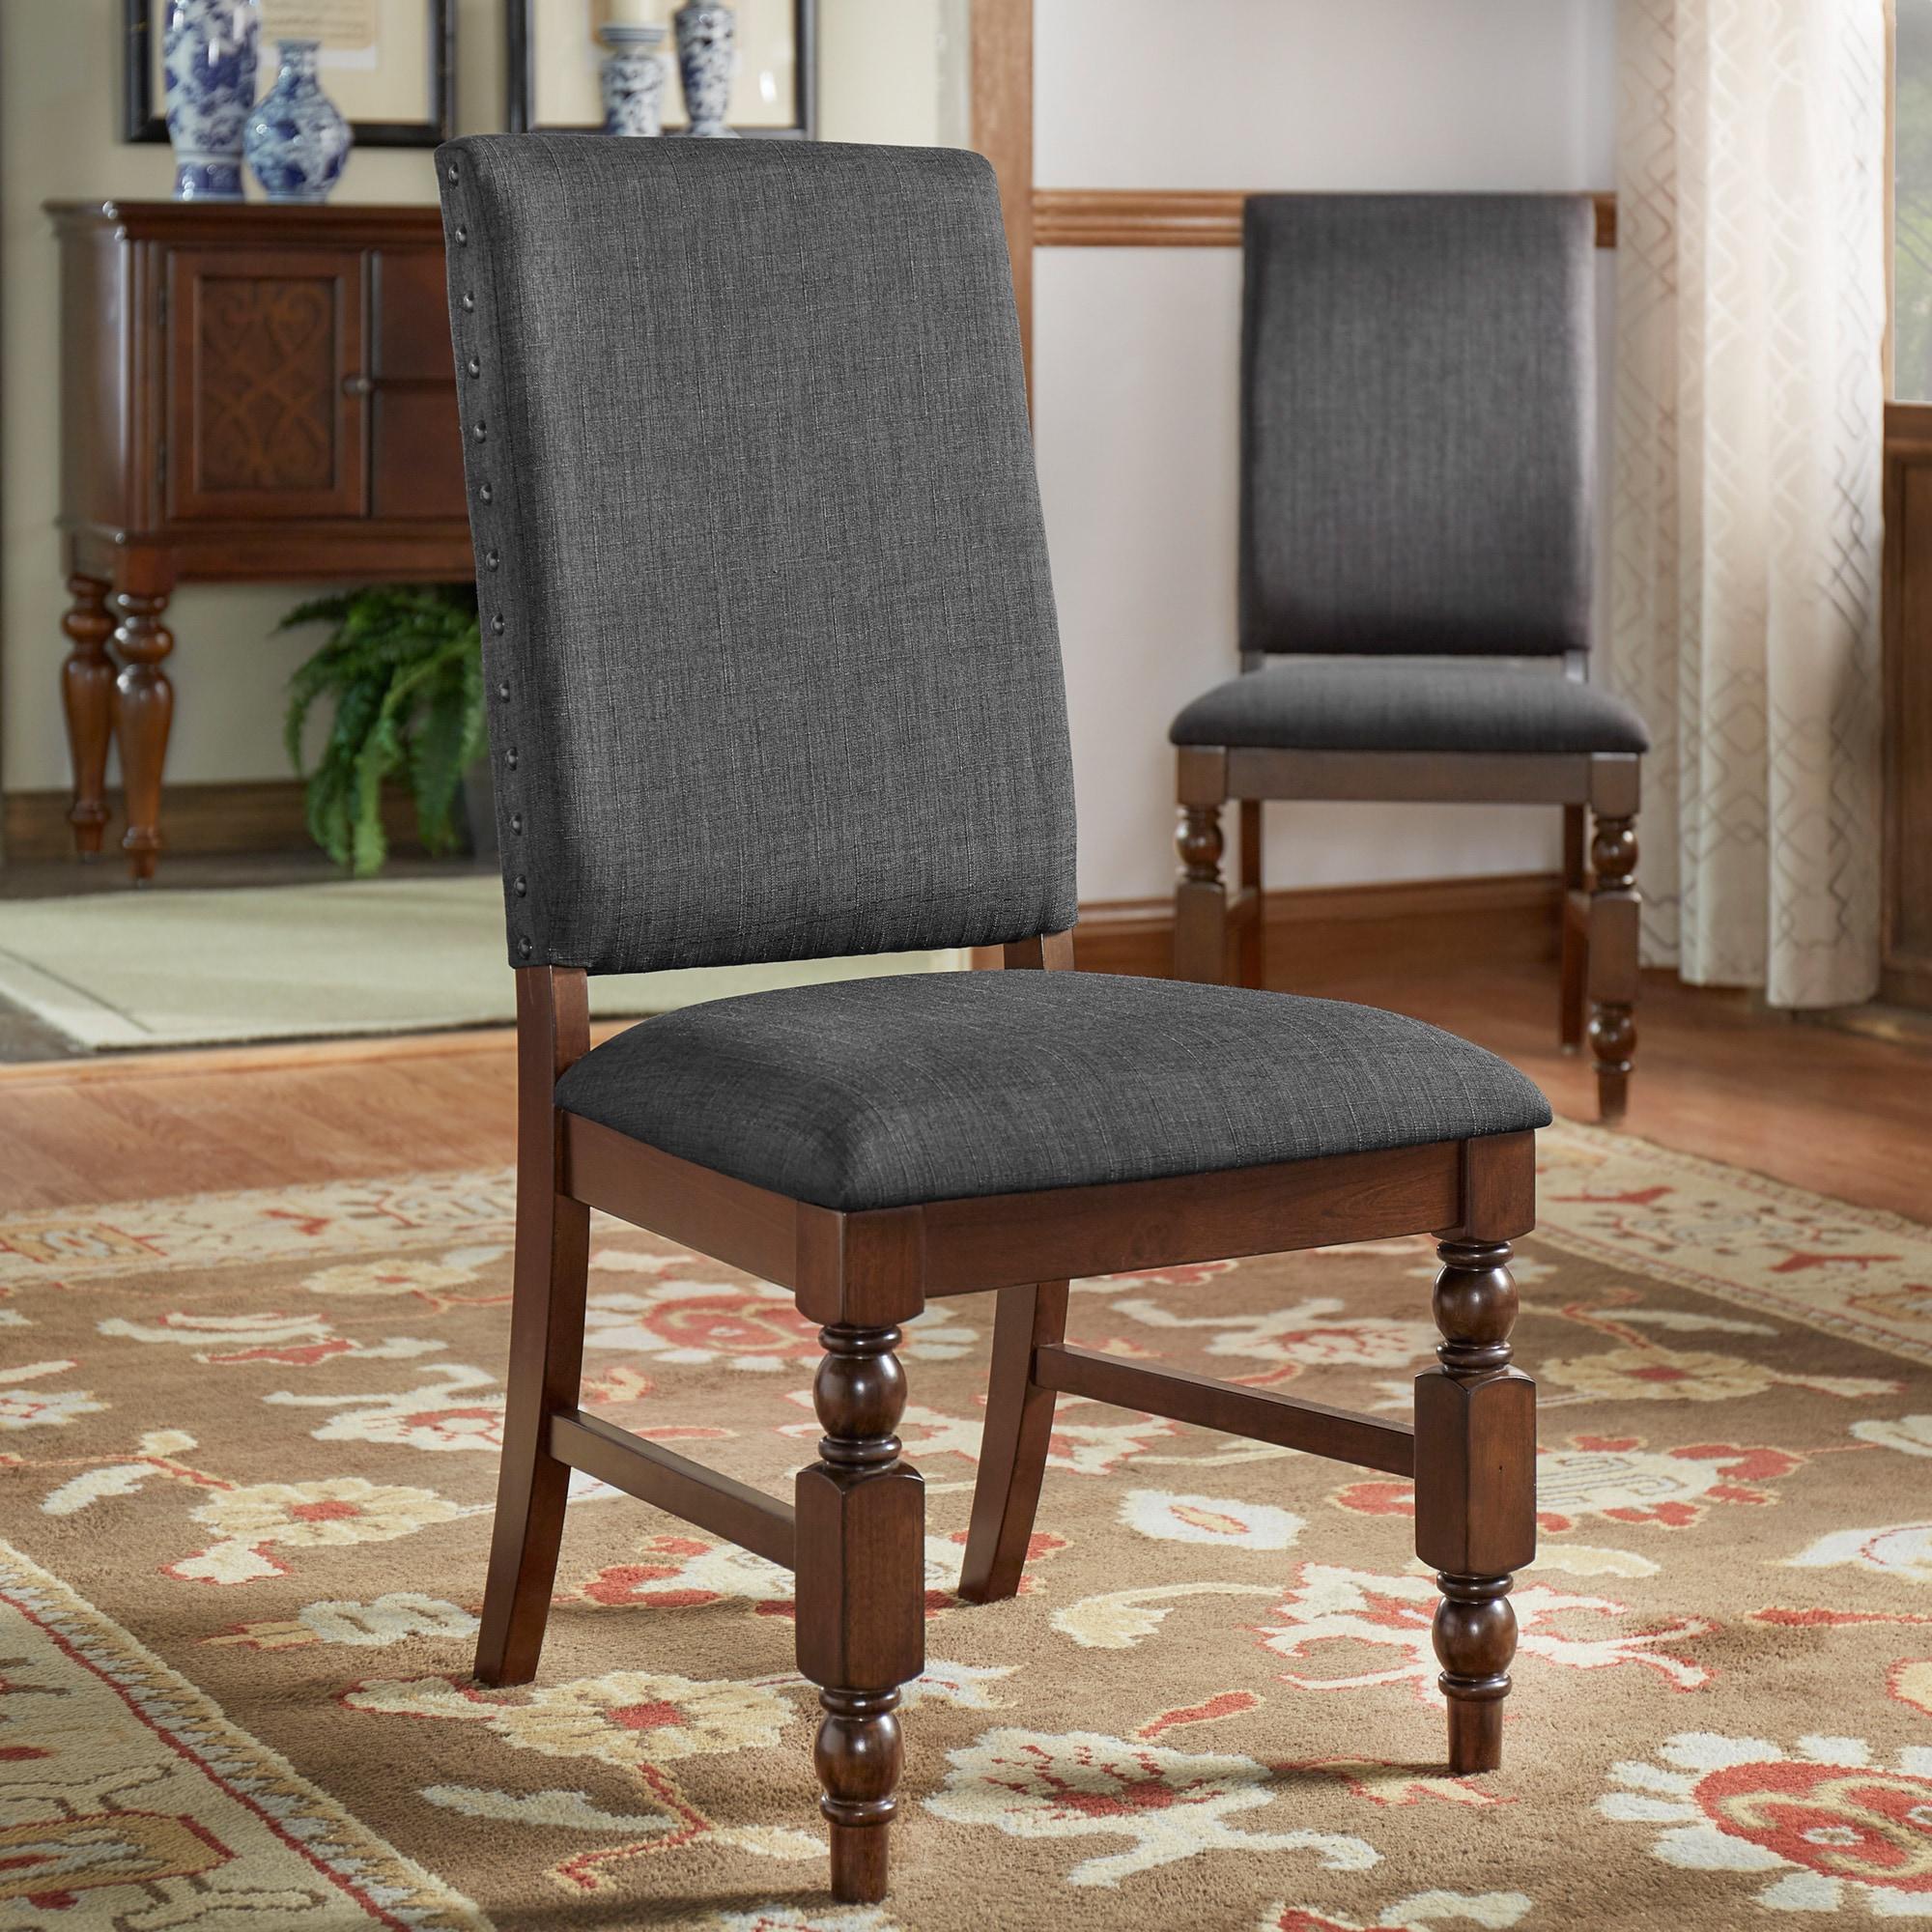 Flatiron Nailhead Upholstered Dining Chairs Set of 2 Flatiron Nailhead Upholstered Dining Chairs Set